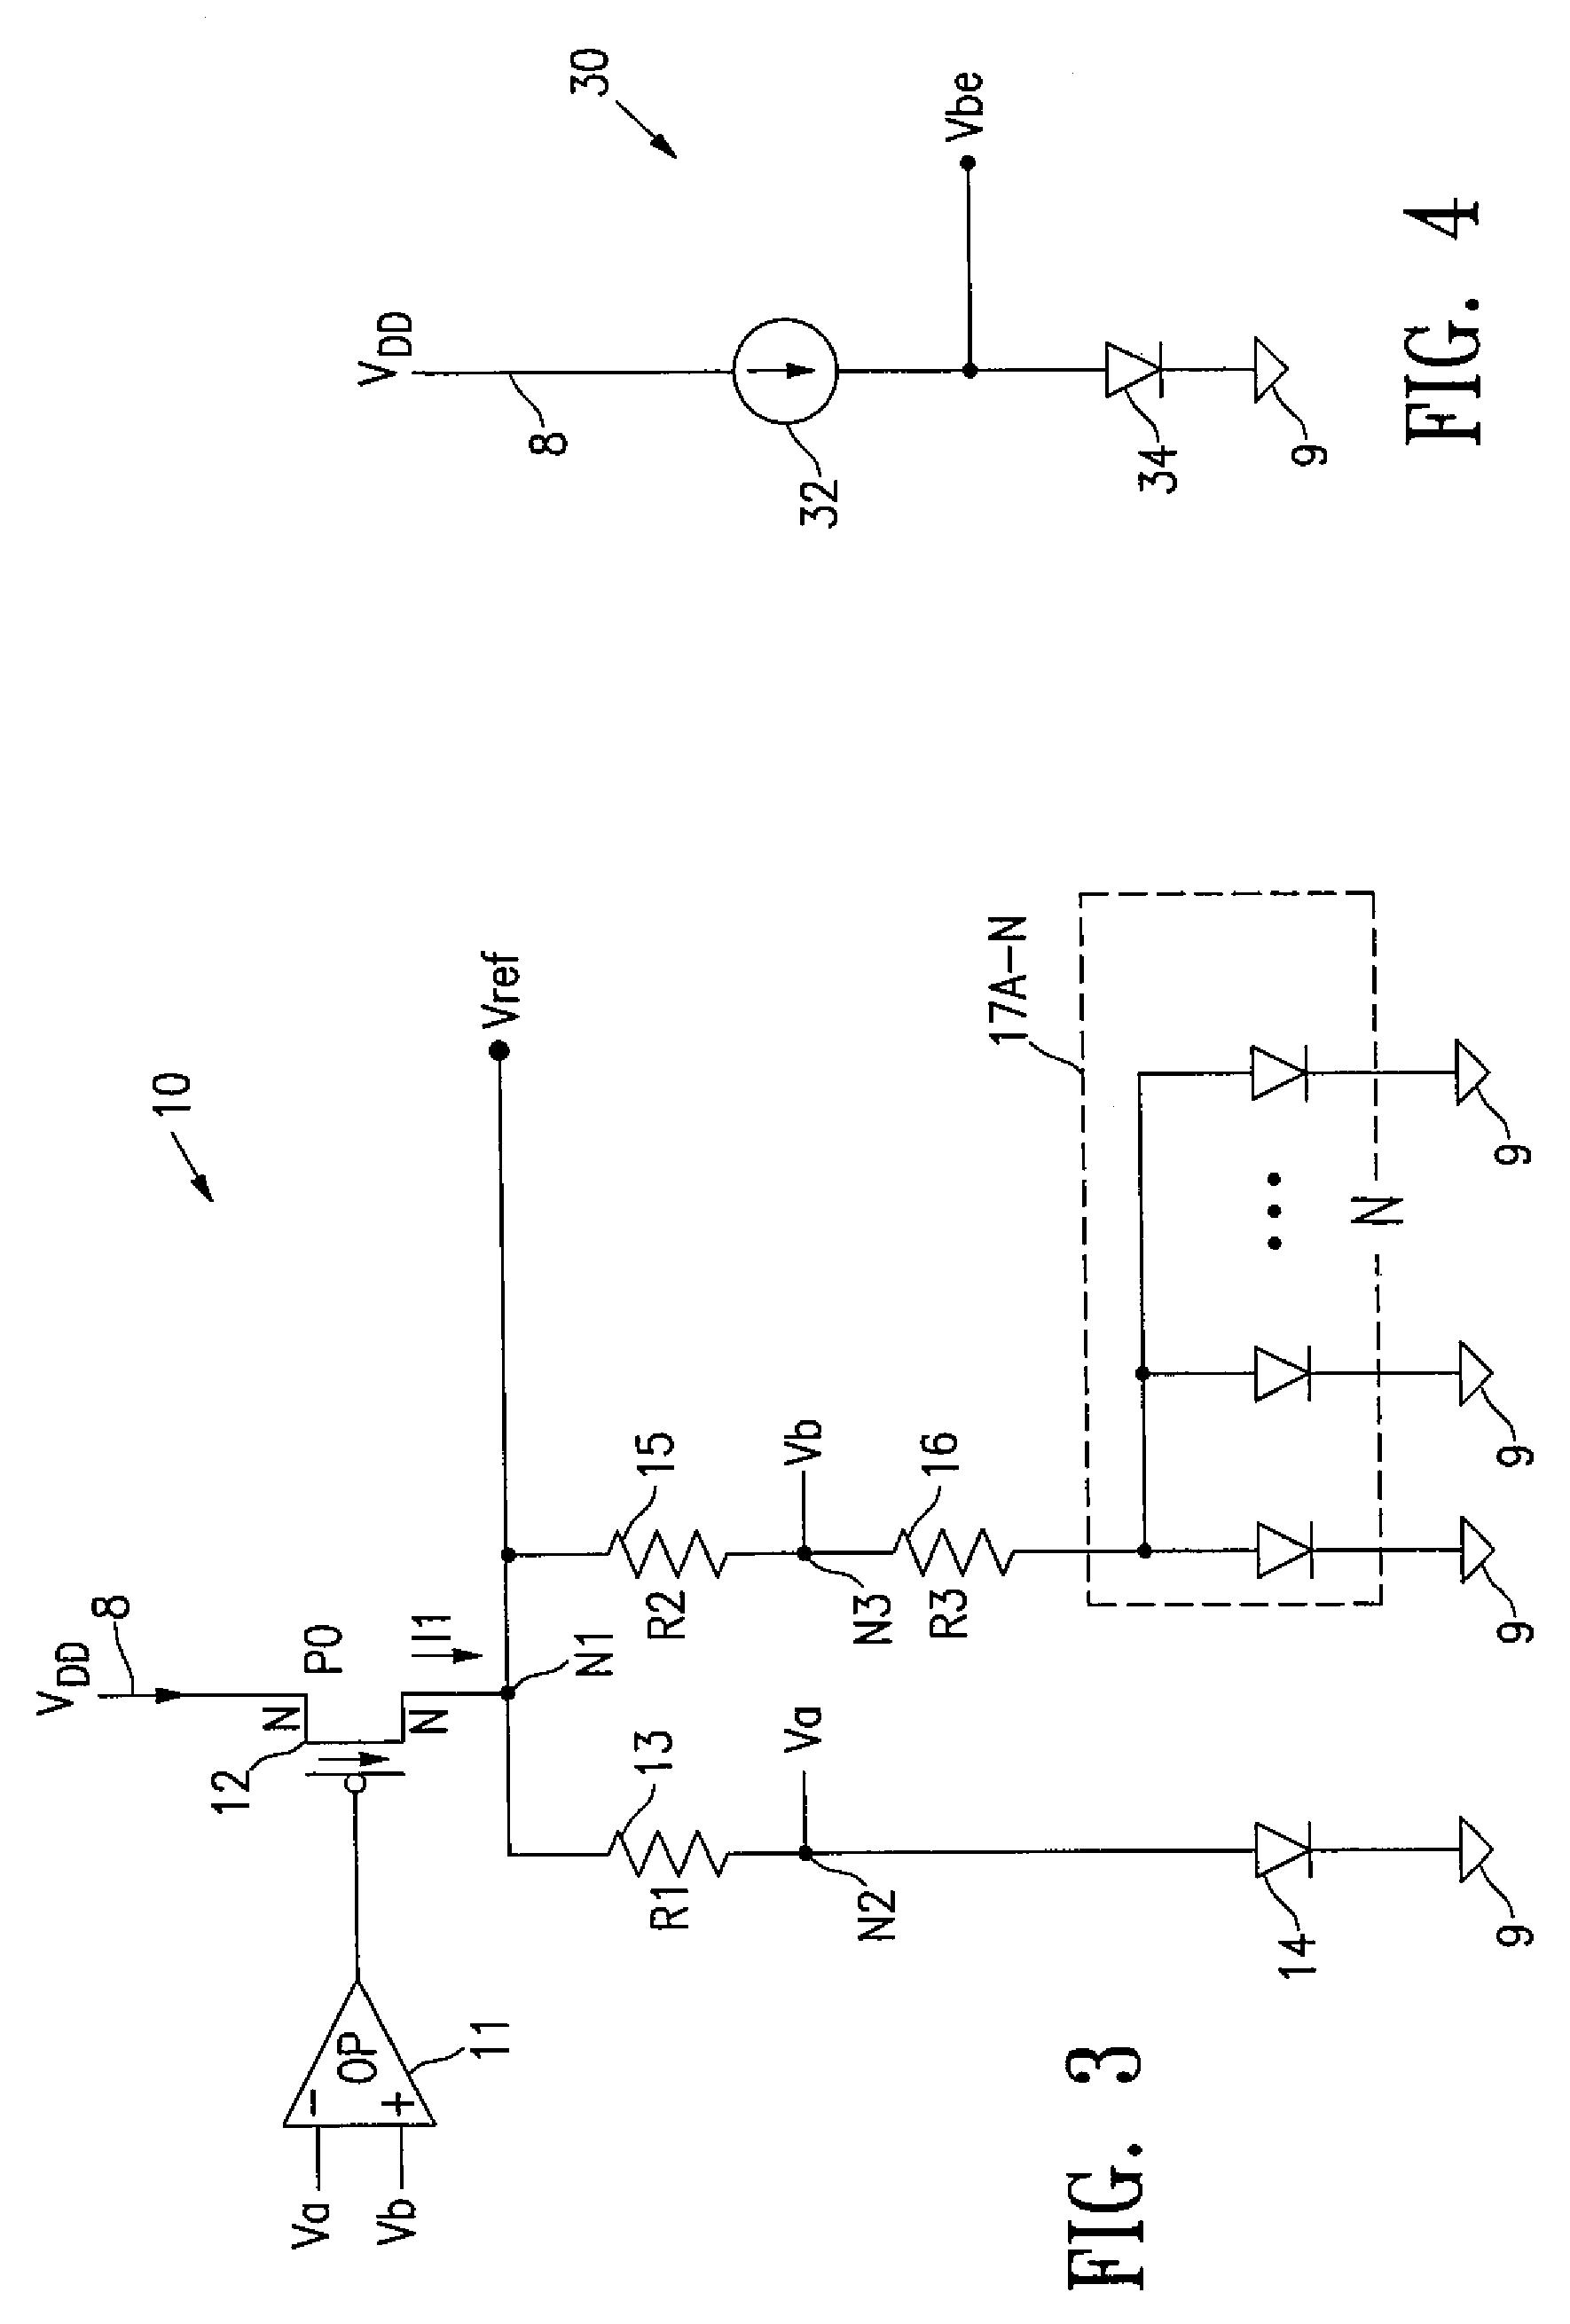 tags: #fender 5 way switch wiring diagram#fender telecaster deluxe wiring  diagram#strat wiring diagram#fender guitar wiring diagrams#fender strat  pickguard